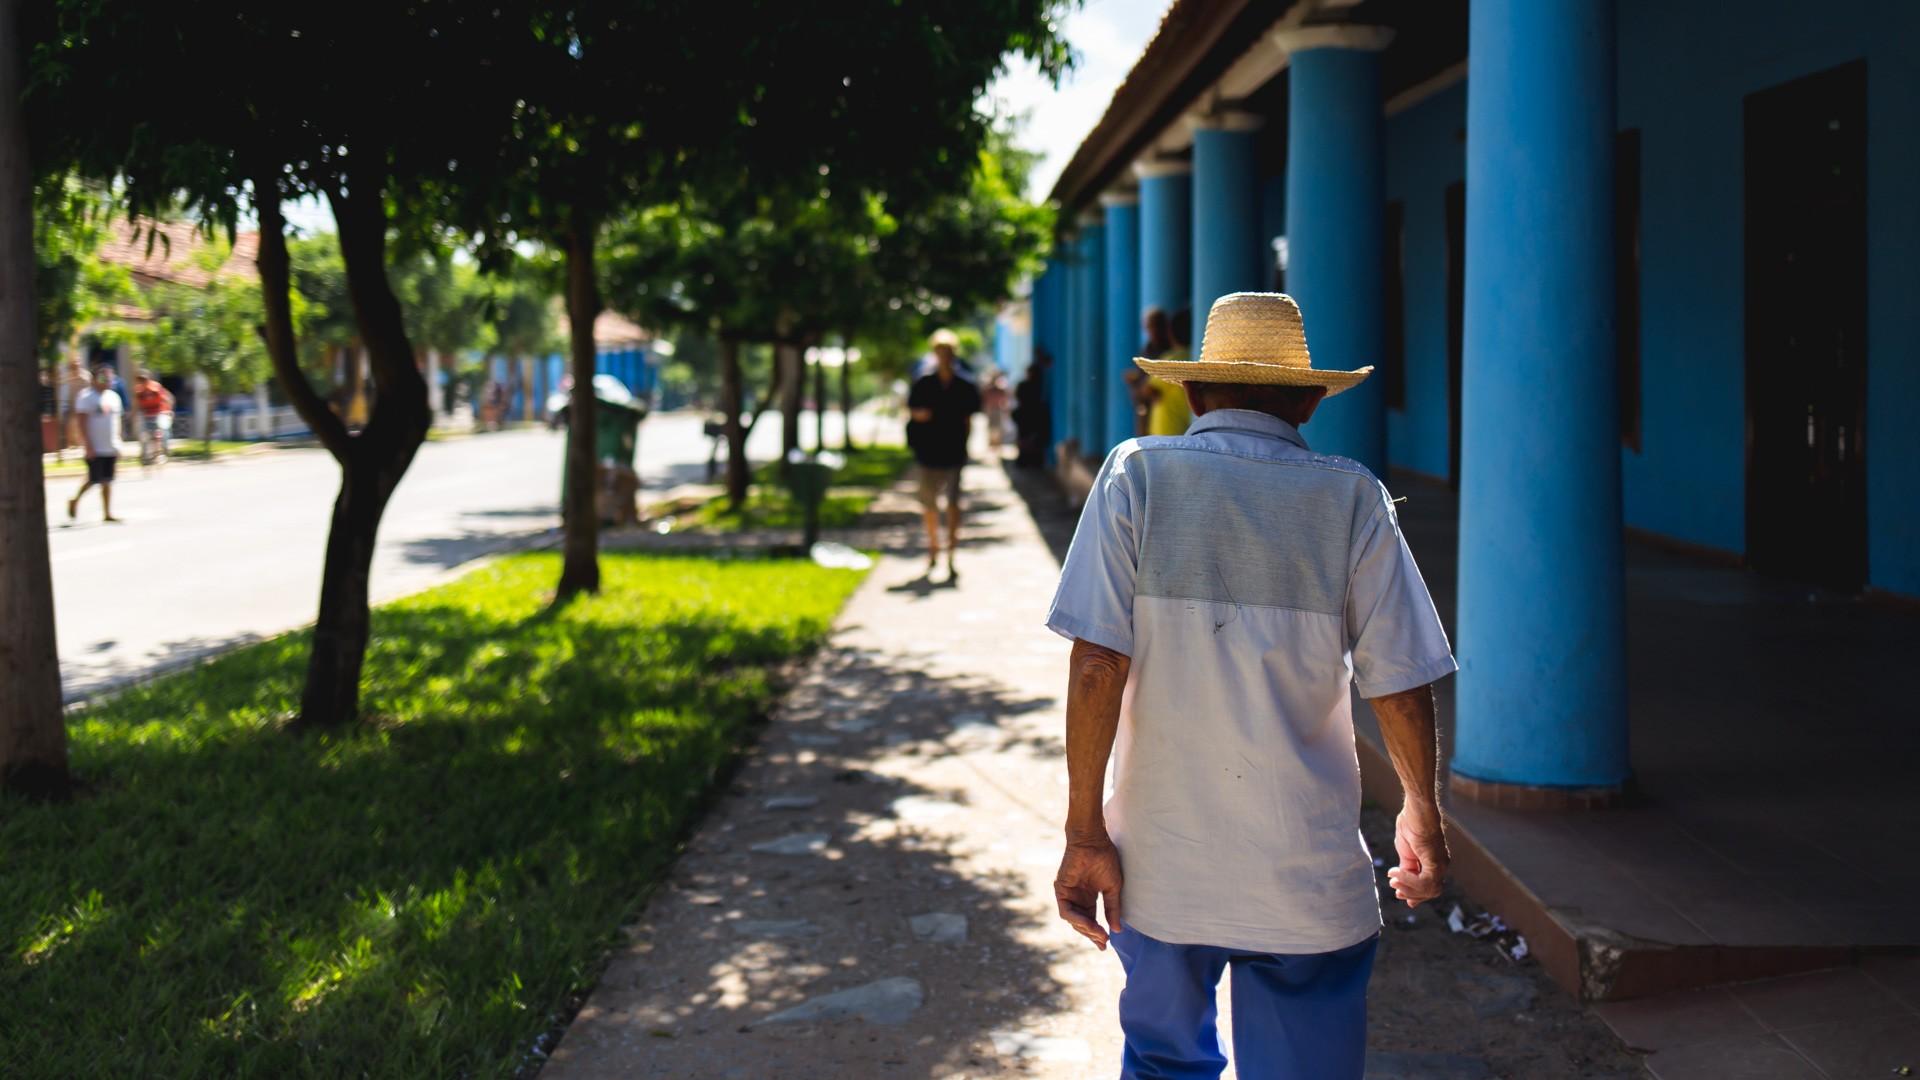 Damien-Dohmen-Photographe-Cuba-13